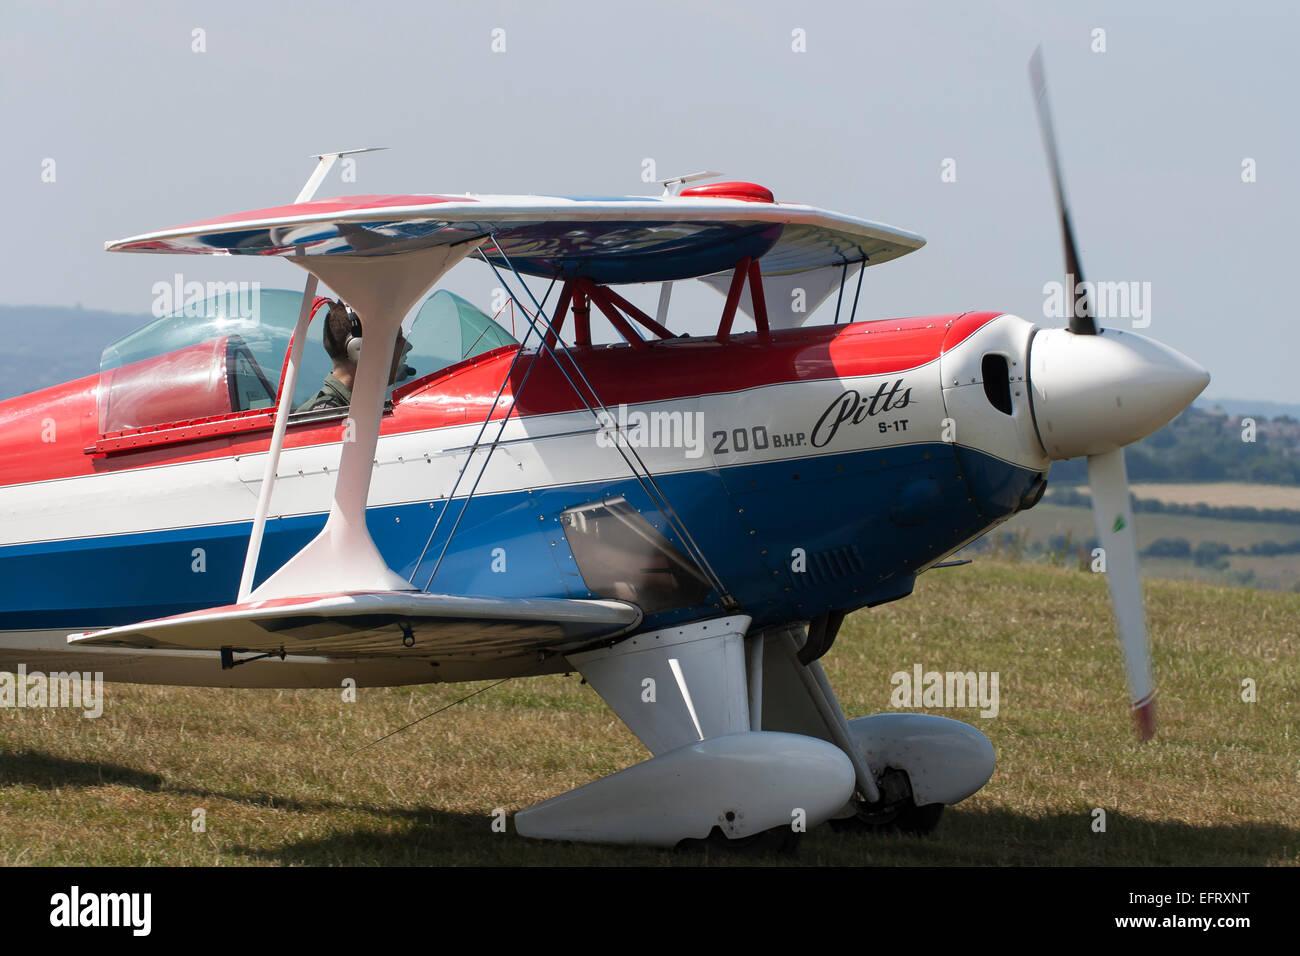 Photograph of a Pitts Aerobatic aircraft at Compton Abbas Airfield - Stock Image